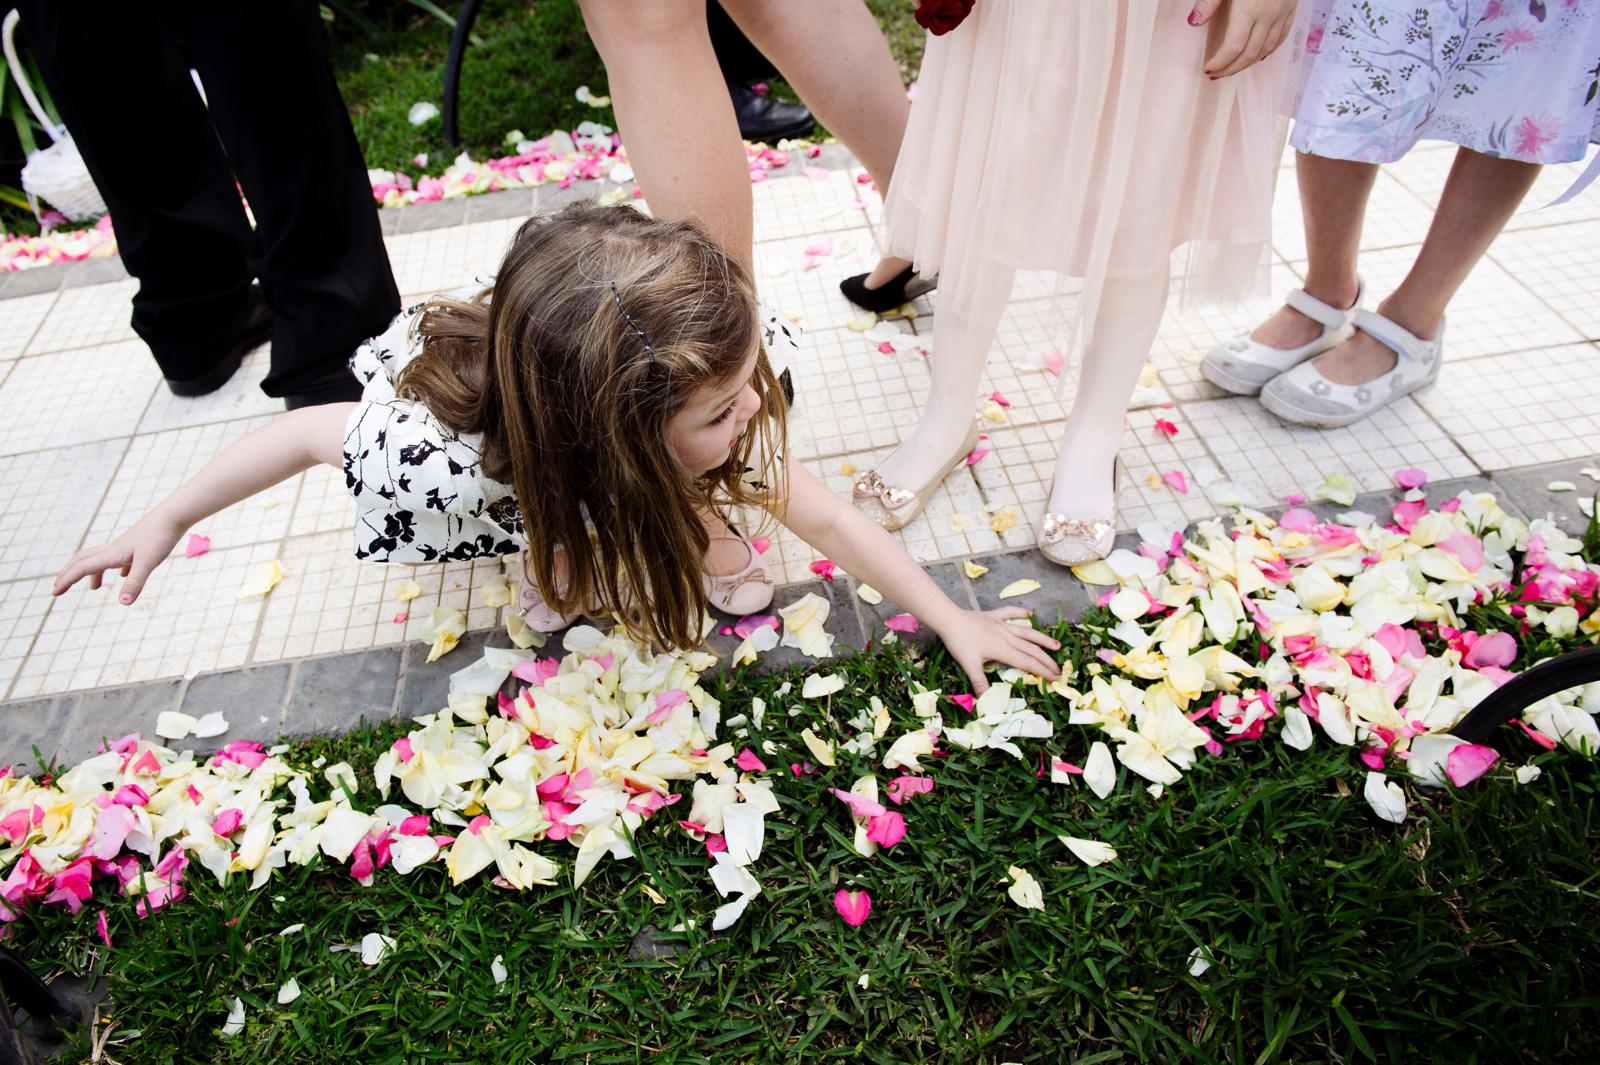 Child picking up petals